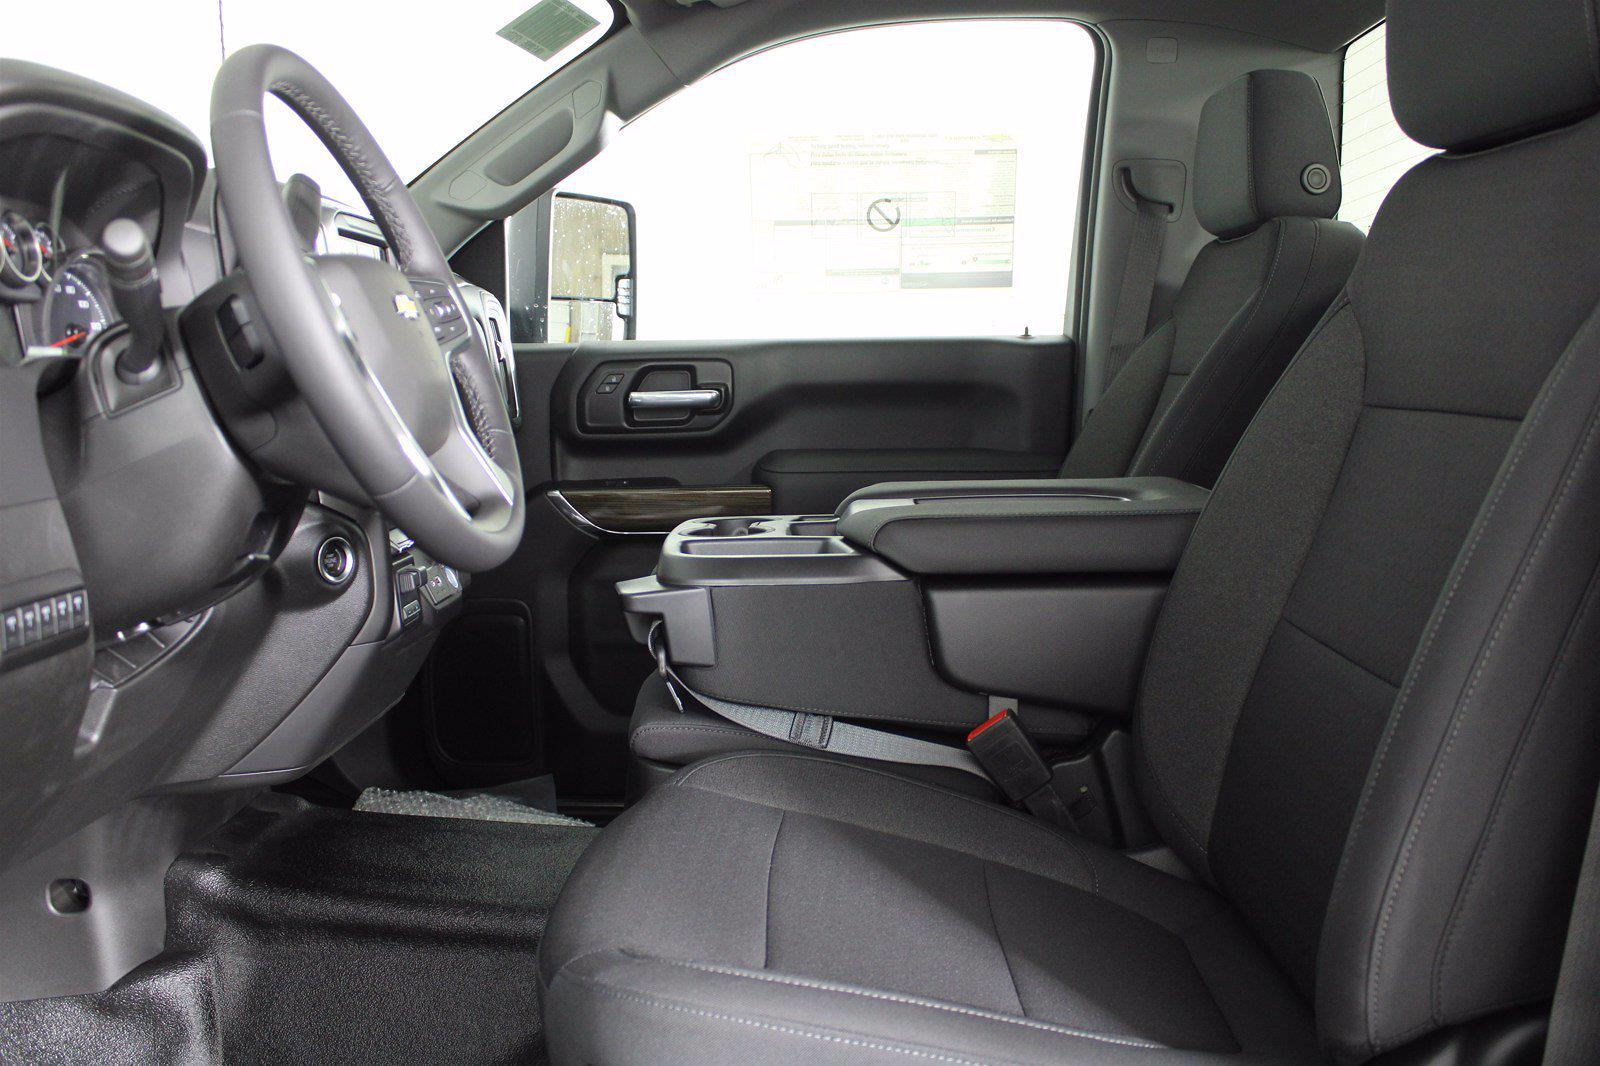 2022 Silverado 2500 Regular Cab 4x4,  Pickup #D120019 - photo 13